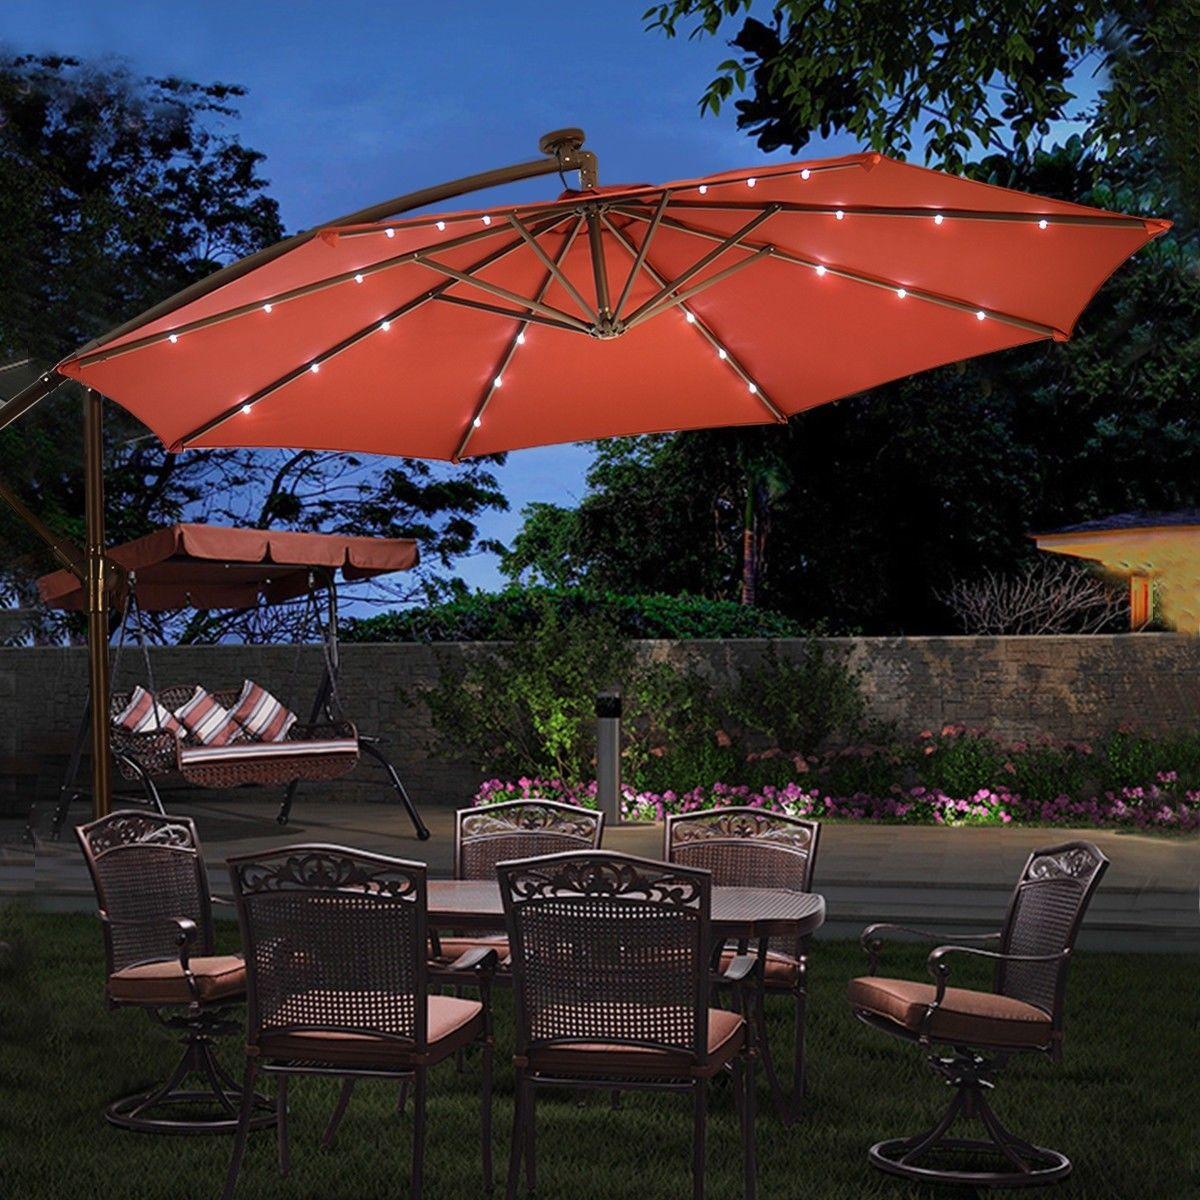 10 Patio Hanging Umbrella Sun Shade With Solar Led Lights Patio Sun Shades Patio Shade Patio